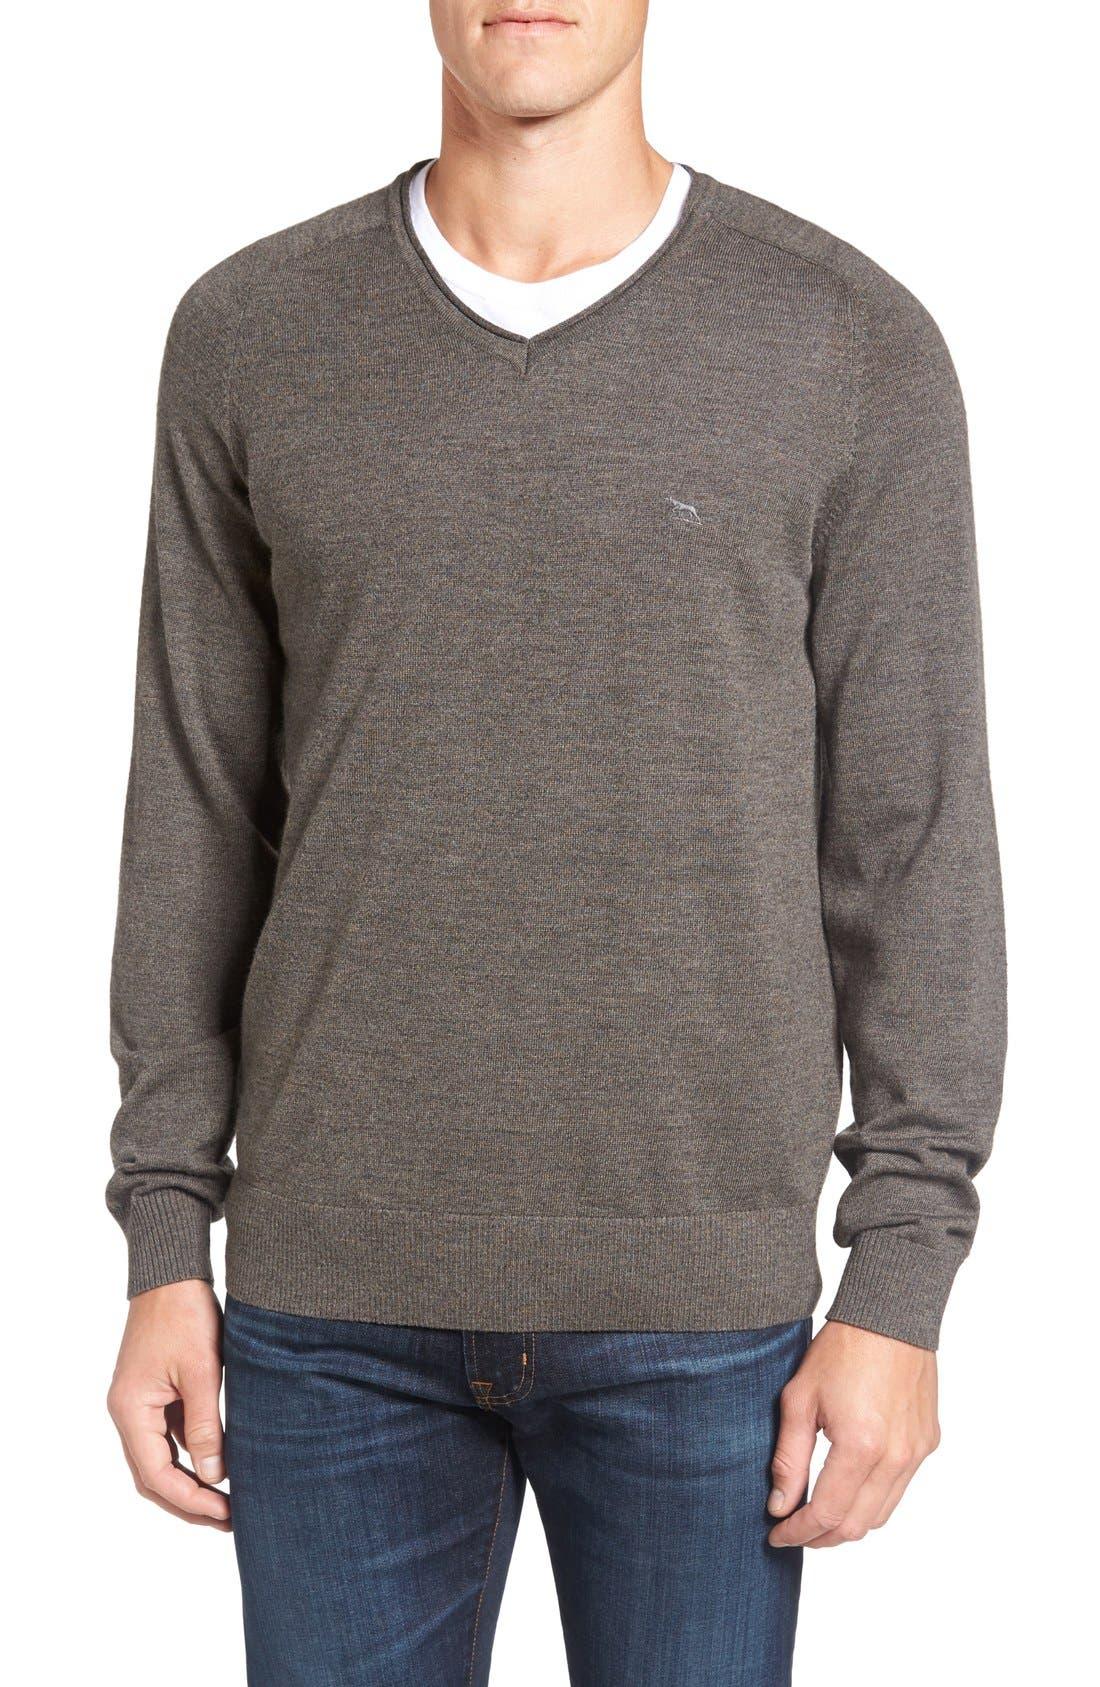 'Burwood Bay' Wool V-Neck Sweater,                             Main thumbnail 1, color,                             259